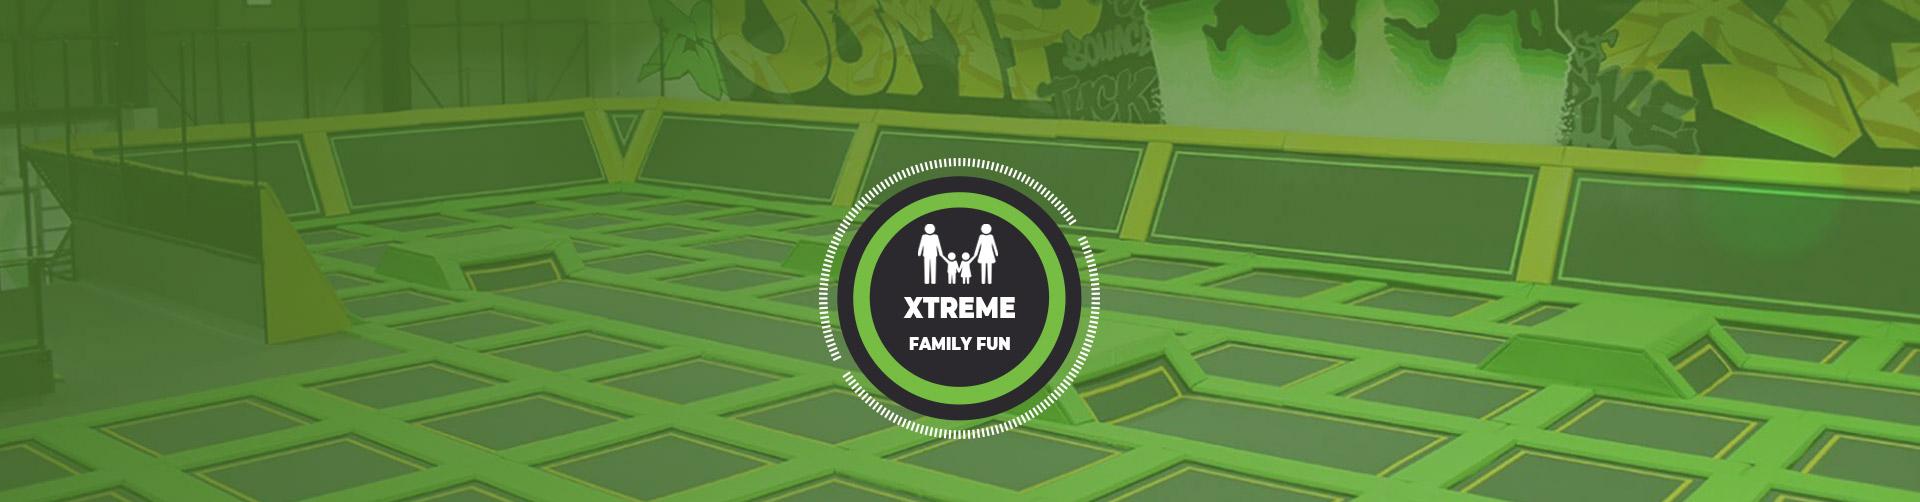 Xtreme Family Fun Jump Xtreme